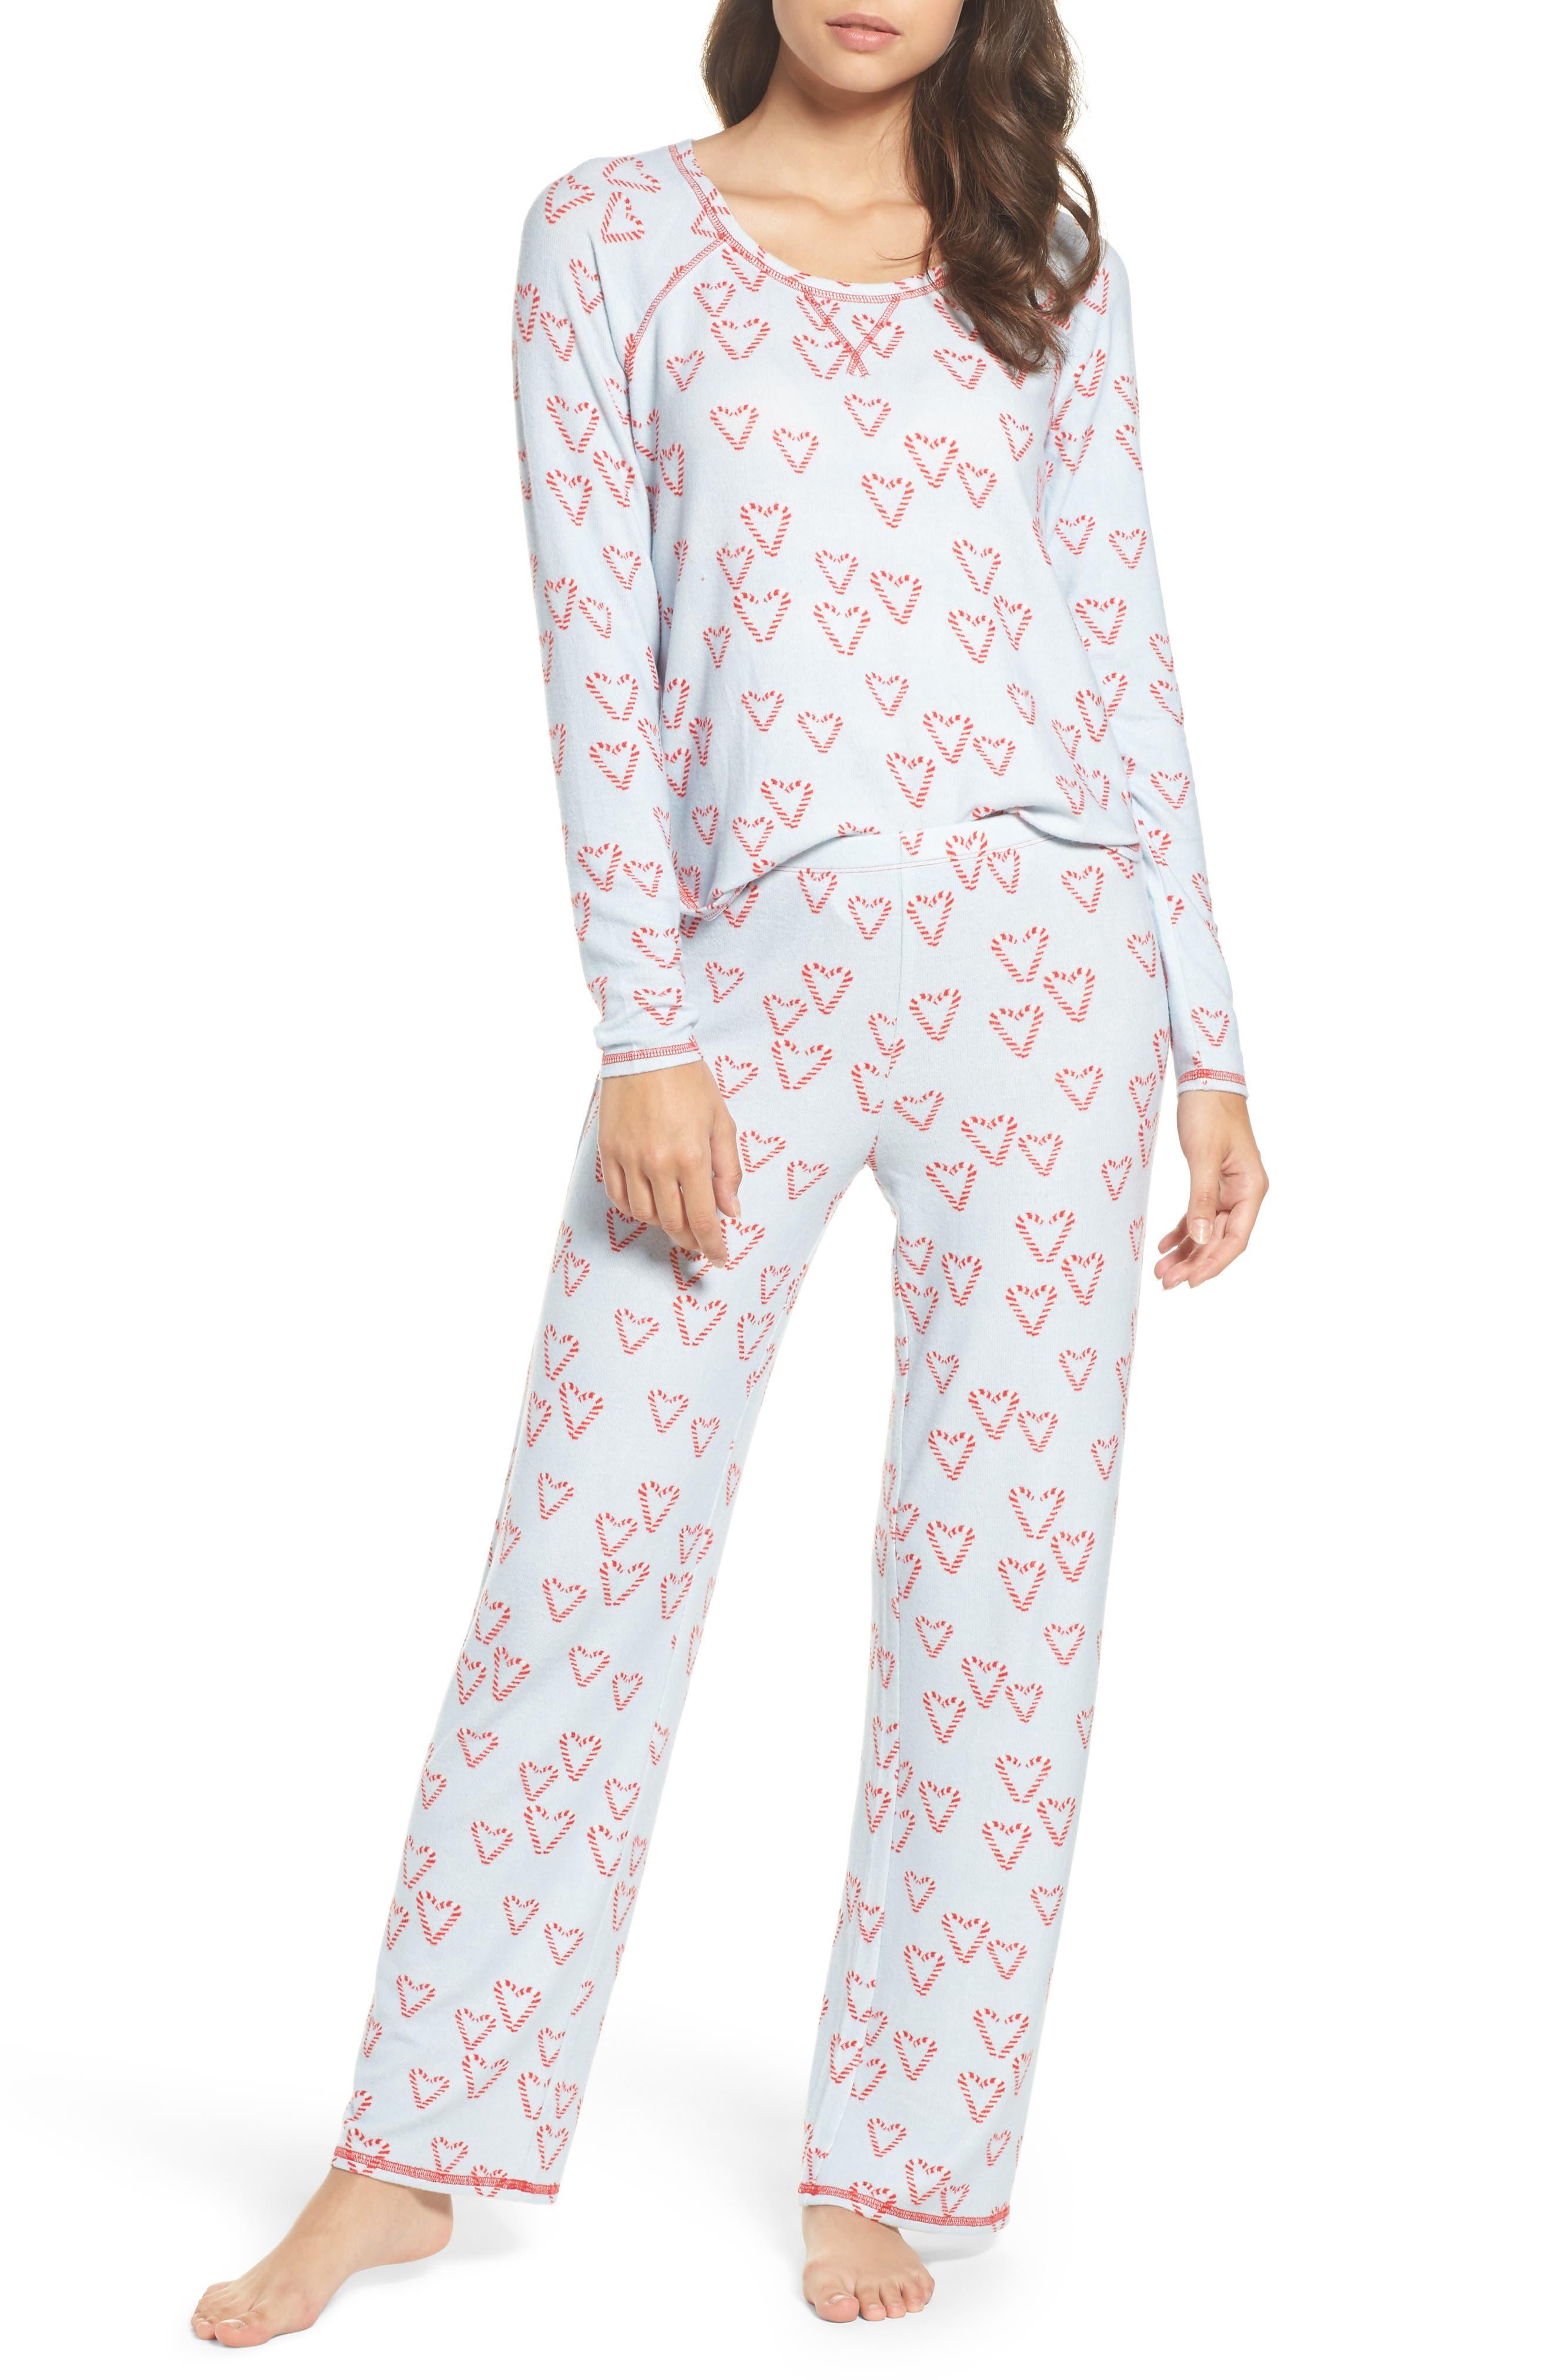 Alternate Image 1 Selected - Make + Model Knit Girlfriend Pajamas & Eye Mask